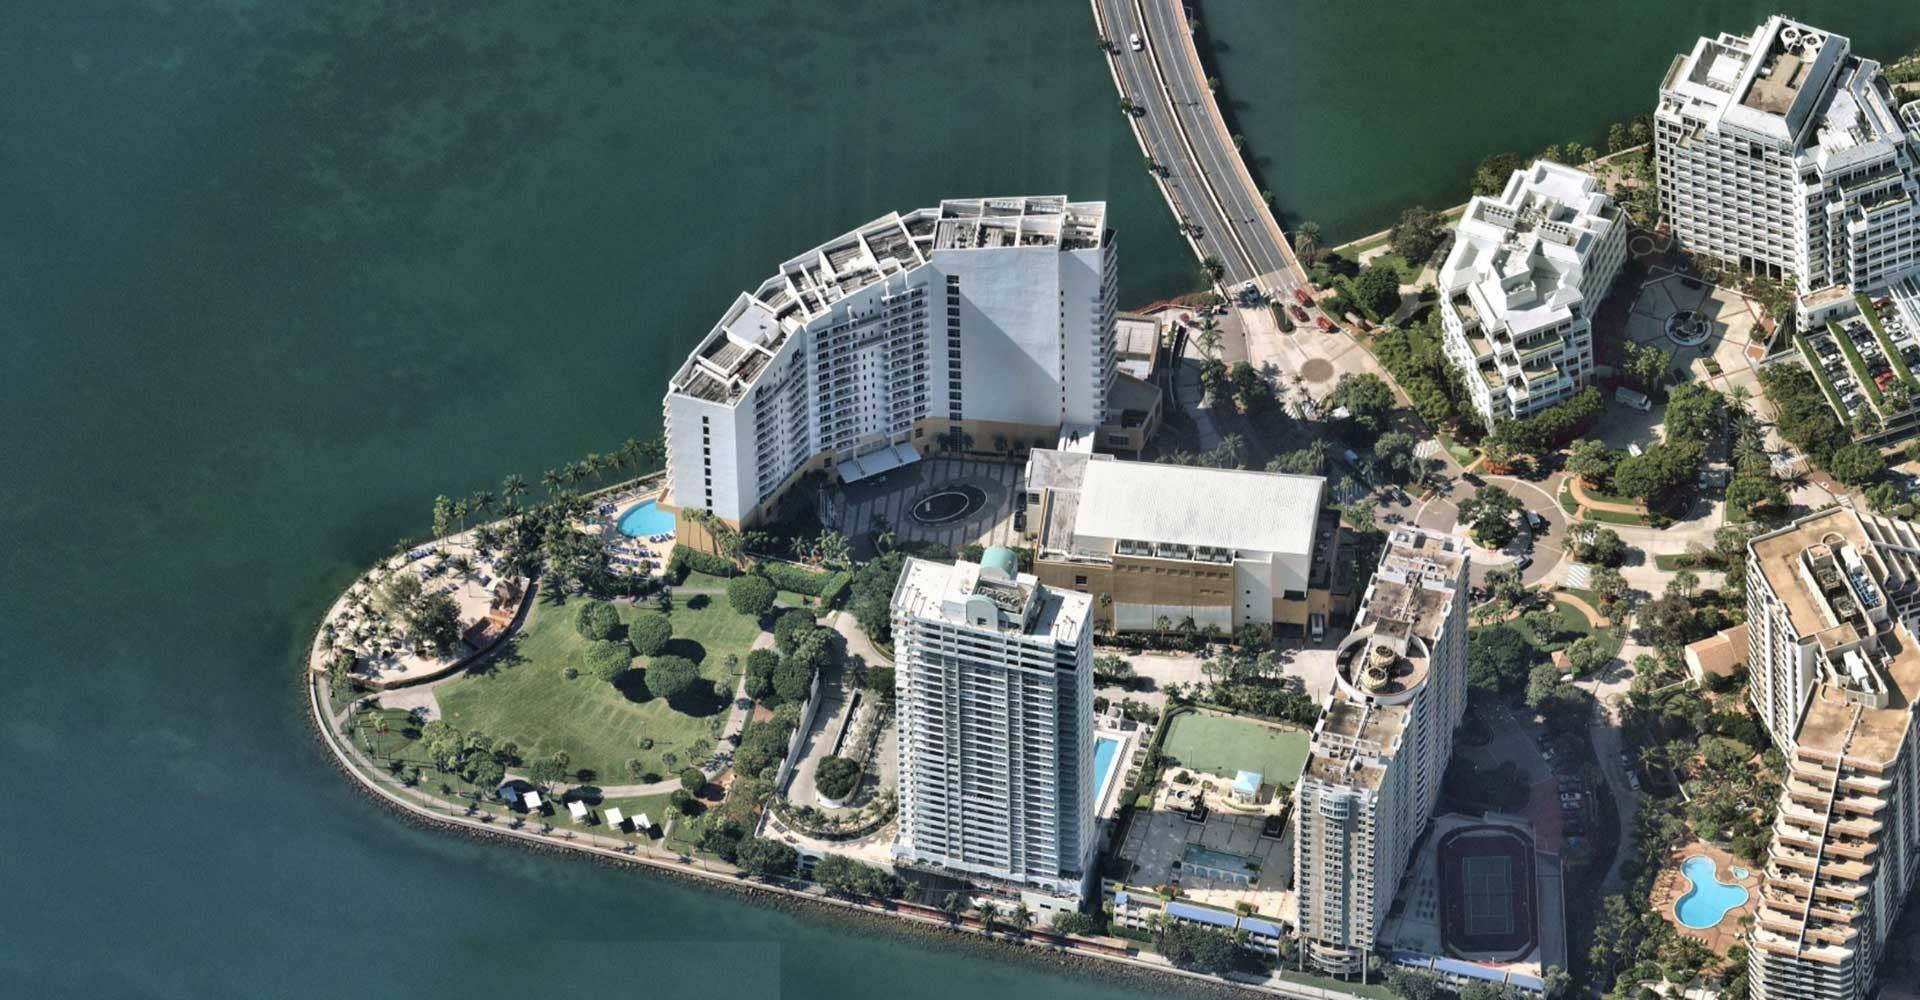 Miami Florida Oblique Aerial Imagery